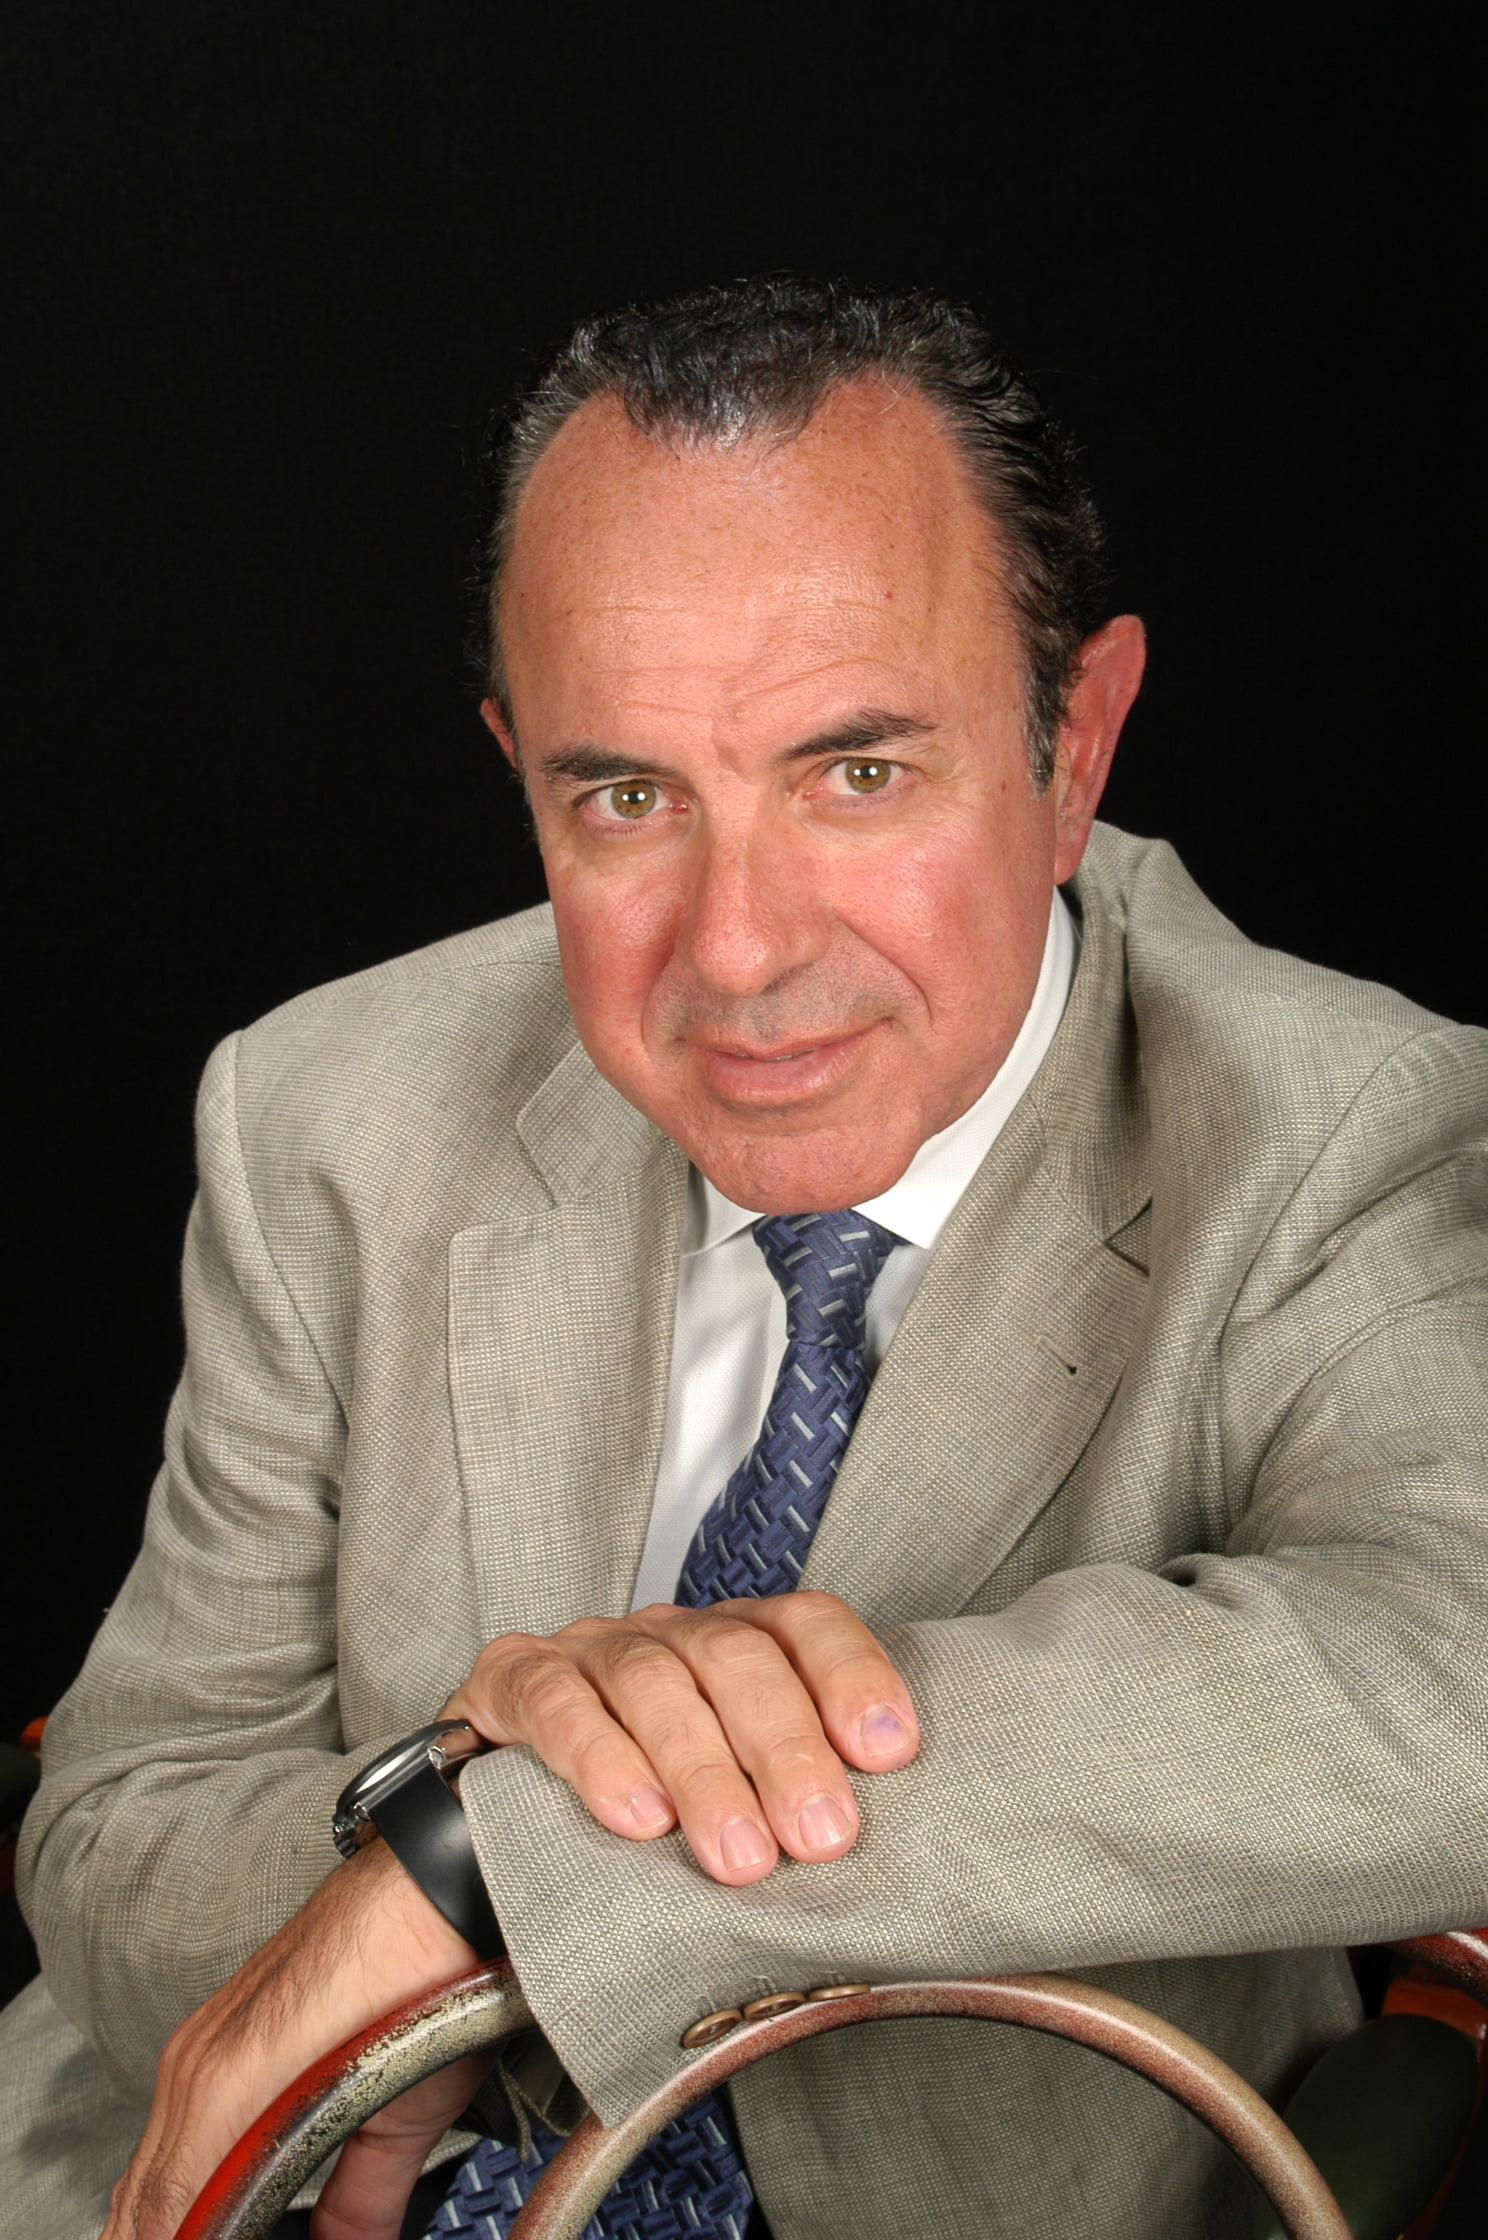 Dr. Alberto Guinot i Madridejos